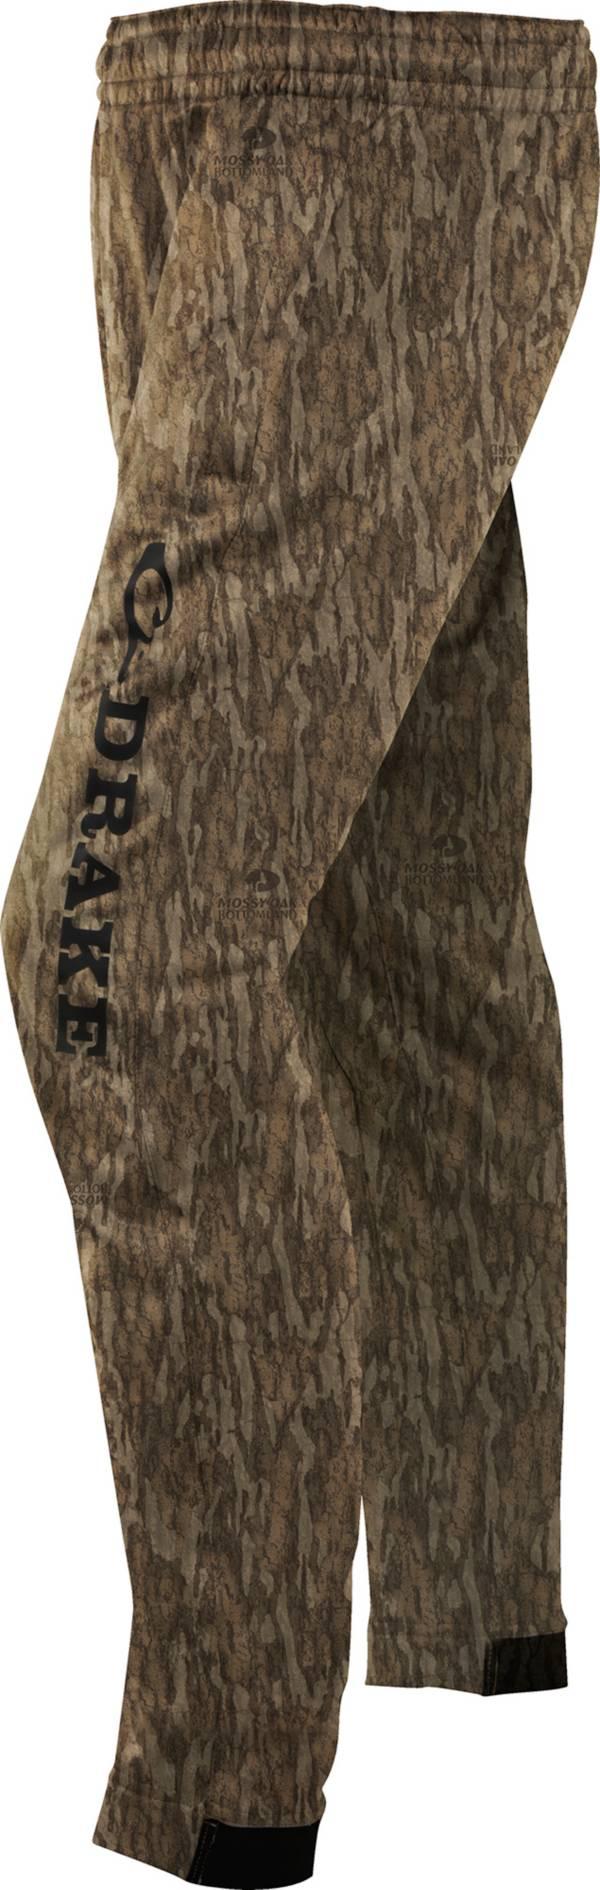 Drake Waterfowl Men's Fleece Wader Hunting Pants product image